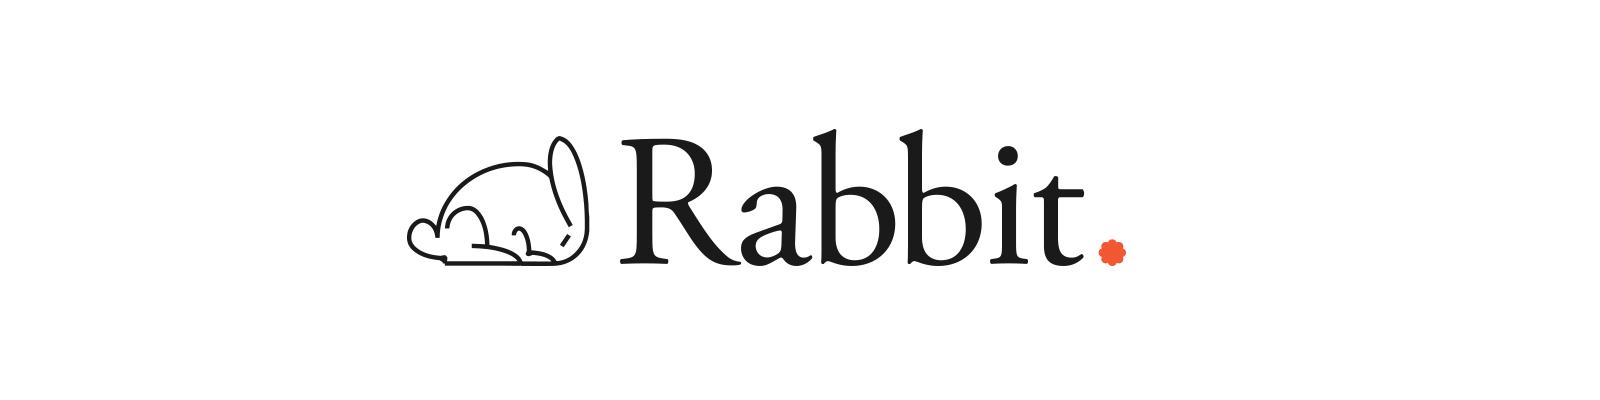 rabbit_web_banner_1.jpg